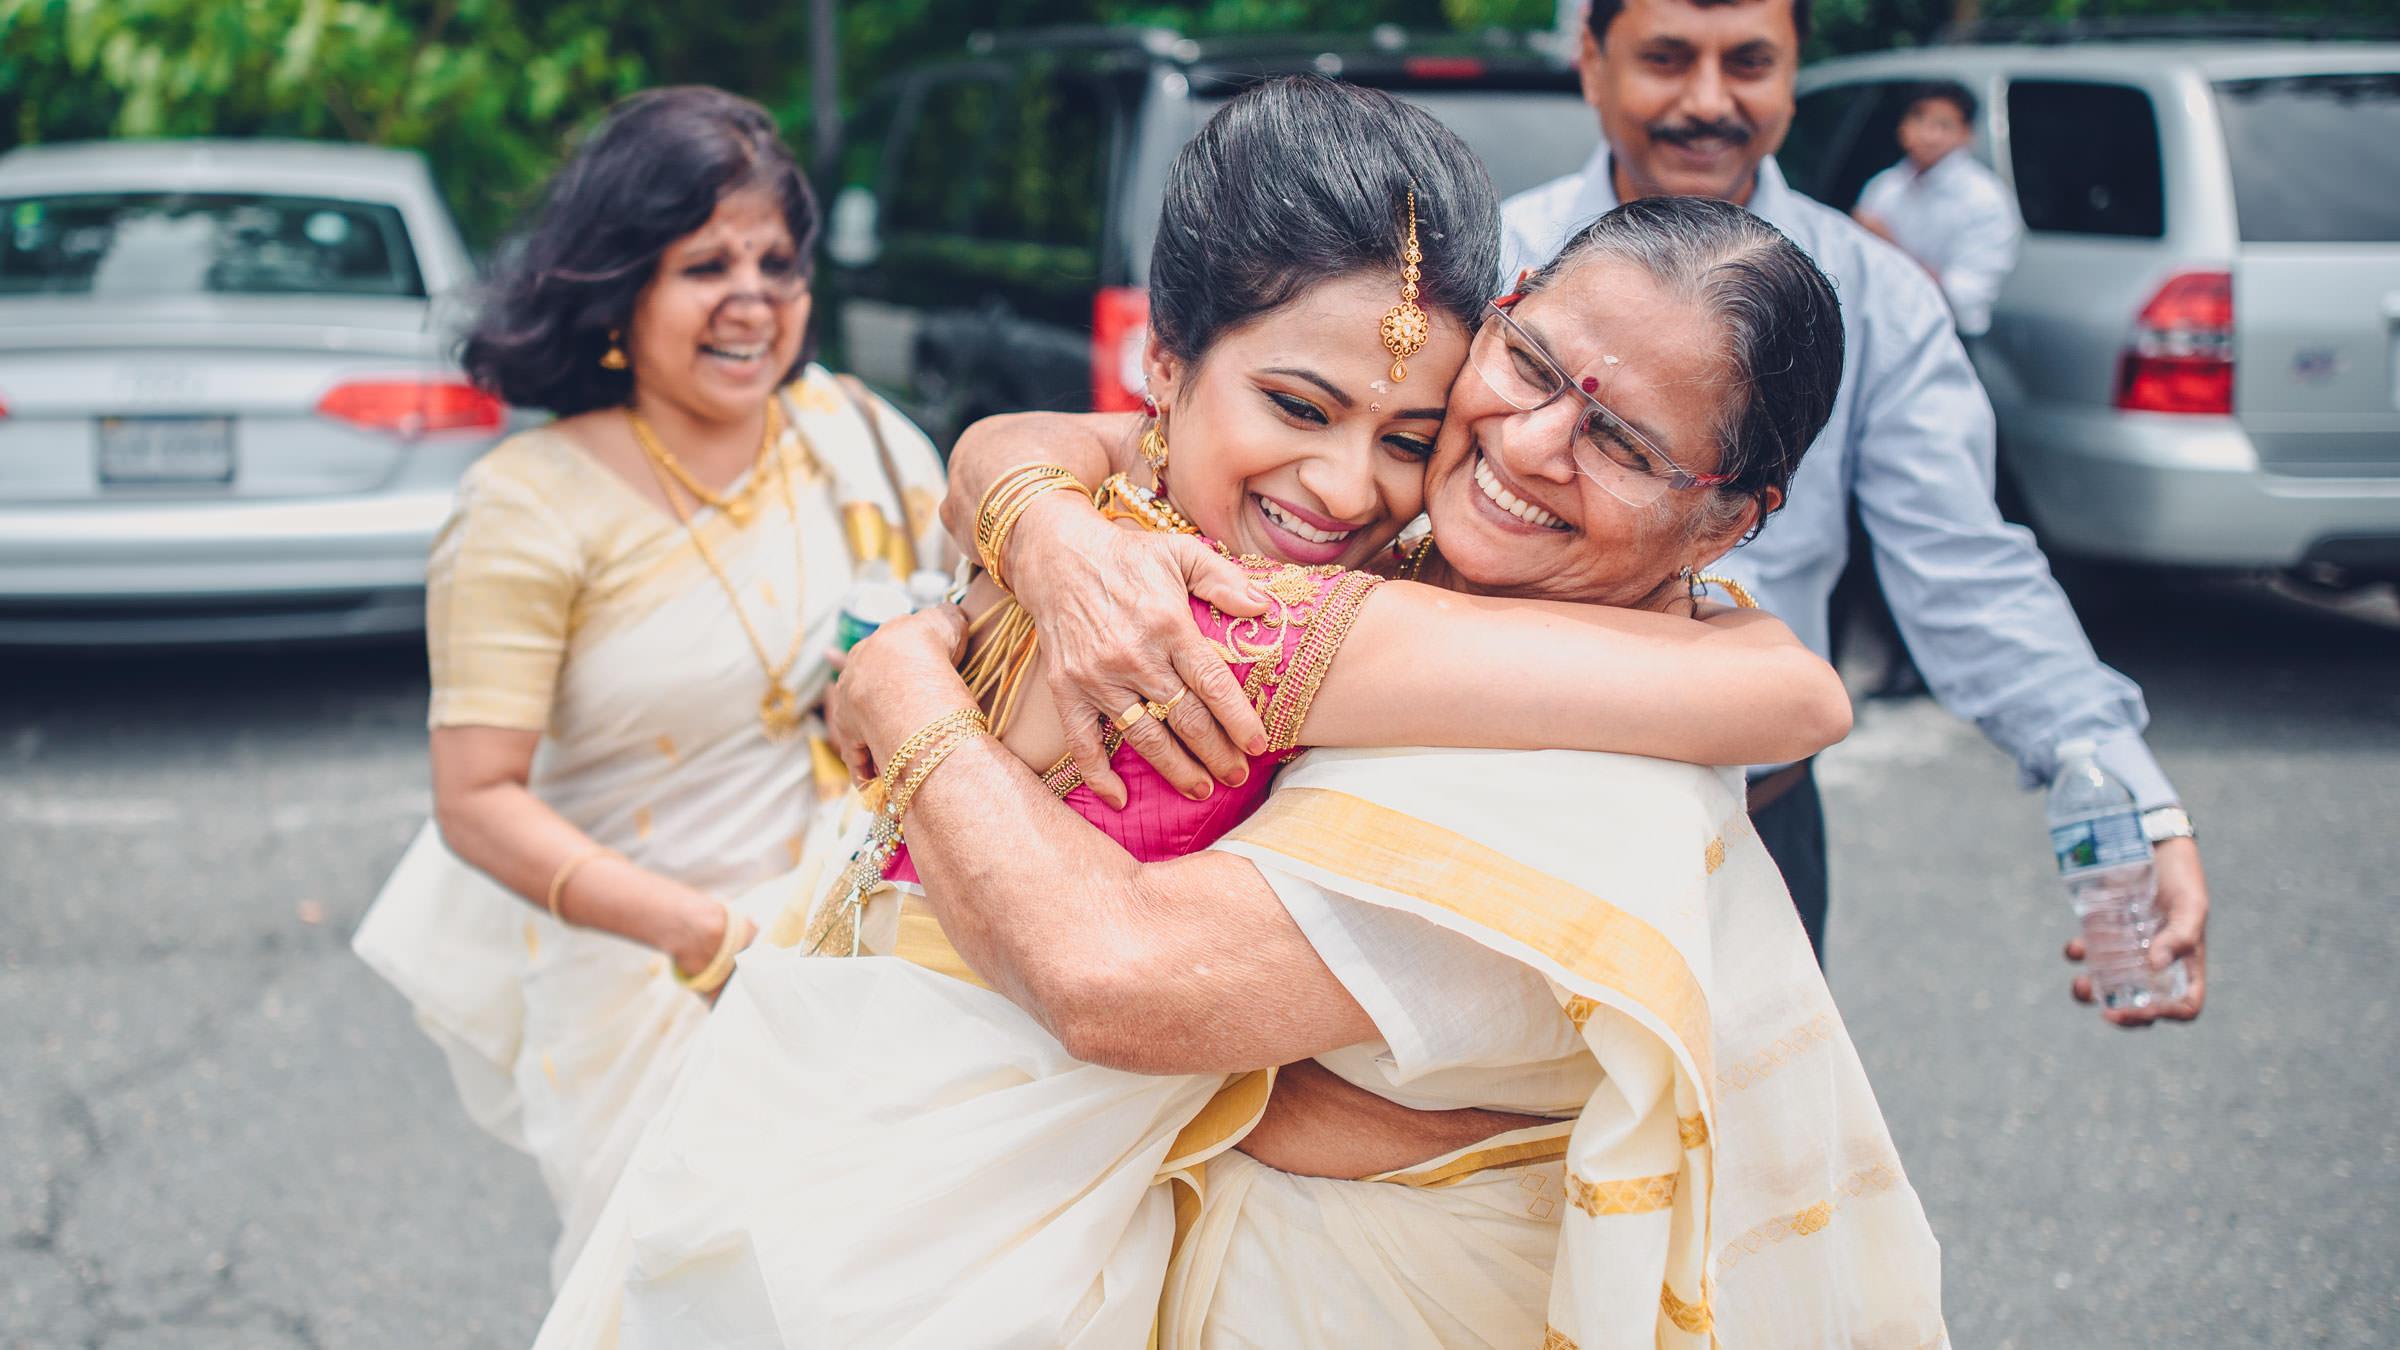 Saving the biggest hugs for Grandma